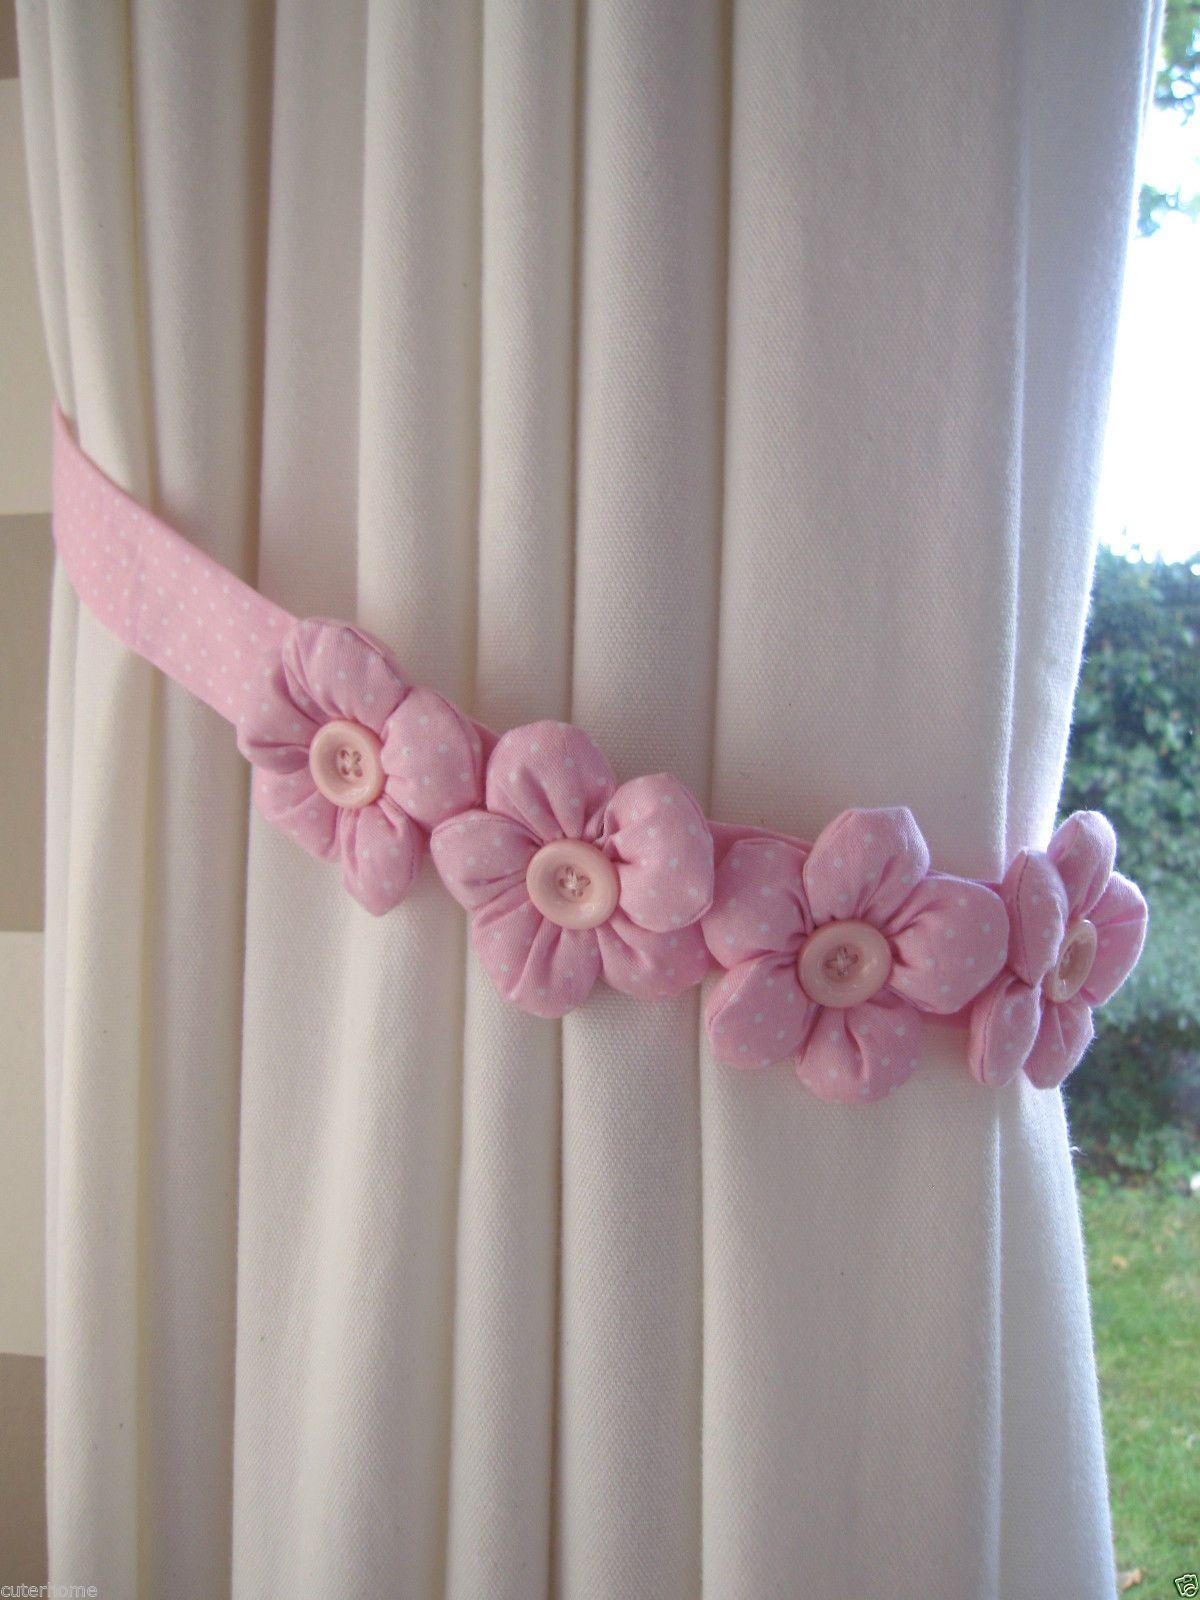 curtain flower room curtains garden of for girls cerise inspirational pleat pencil kids blackout